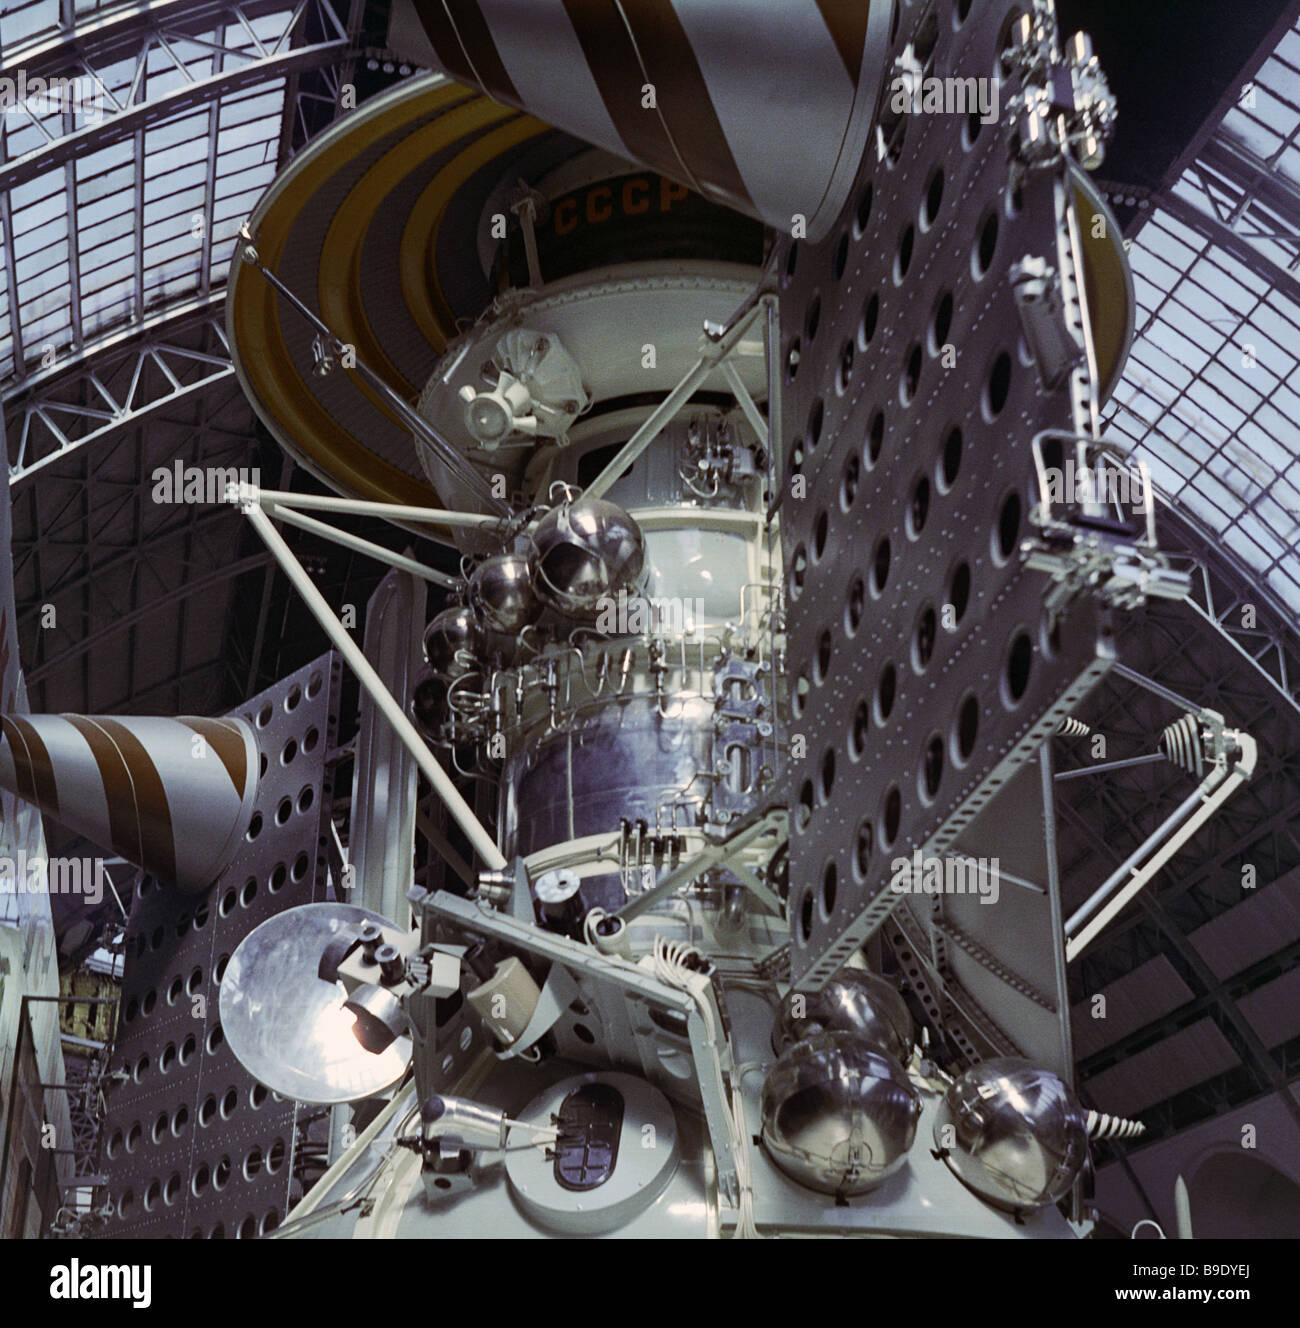 Mars 3 automatic interplanetary station - Stock Image